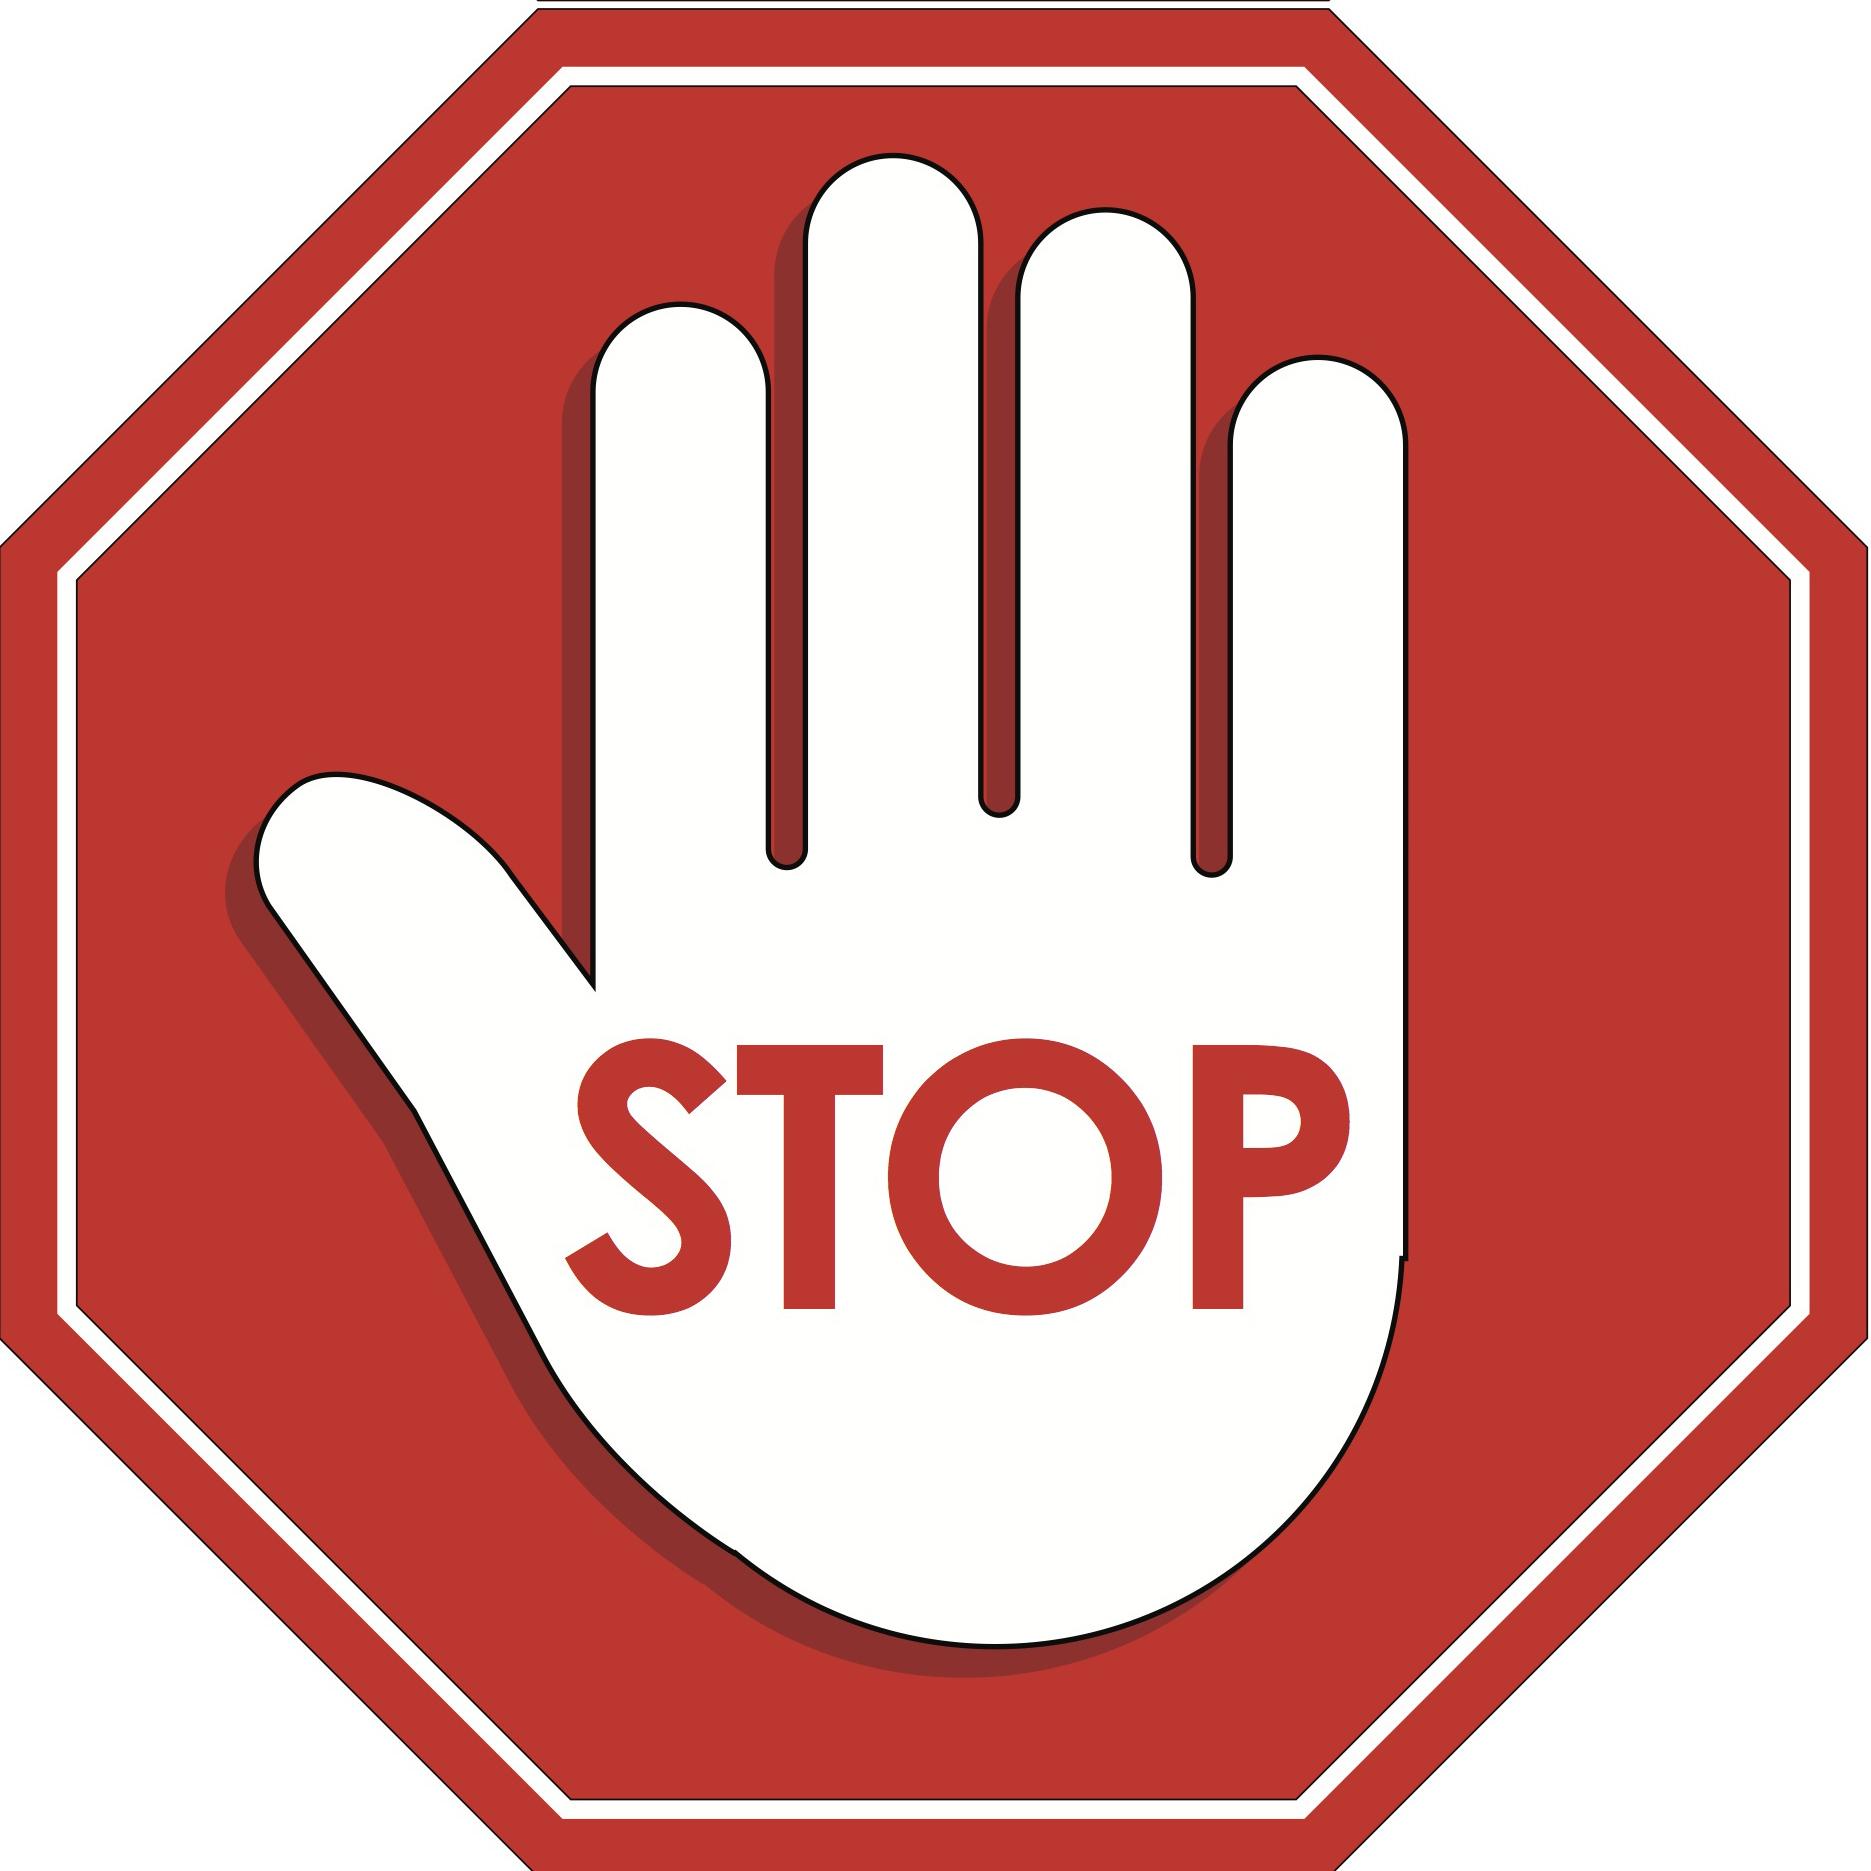 InsureBlog: Breaking: CMS puts kibosh on Gem State ACA plans